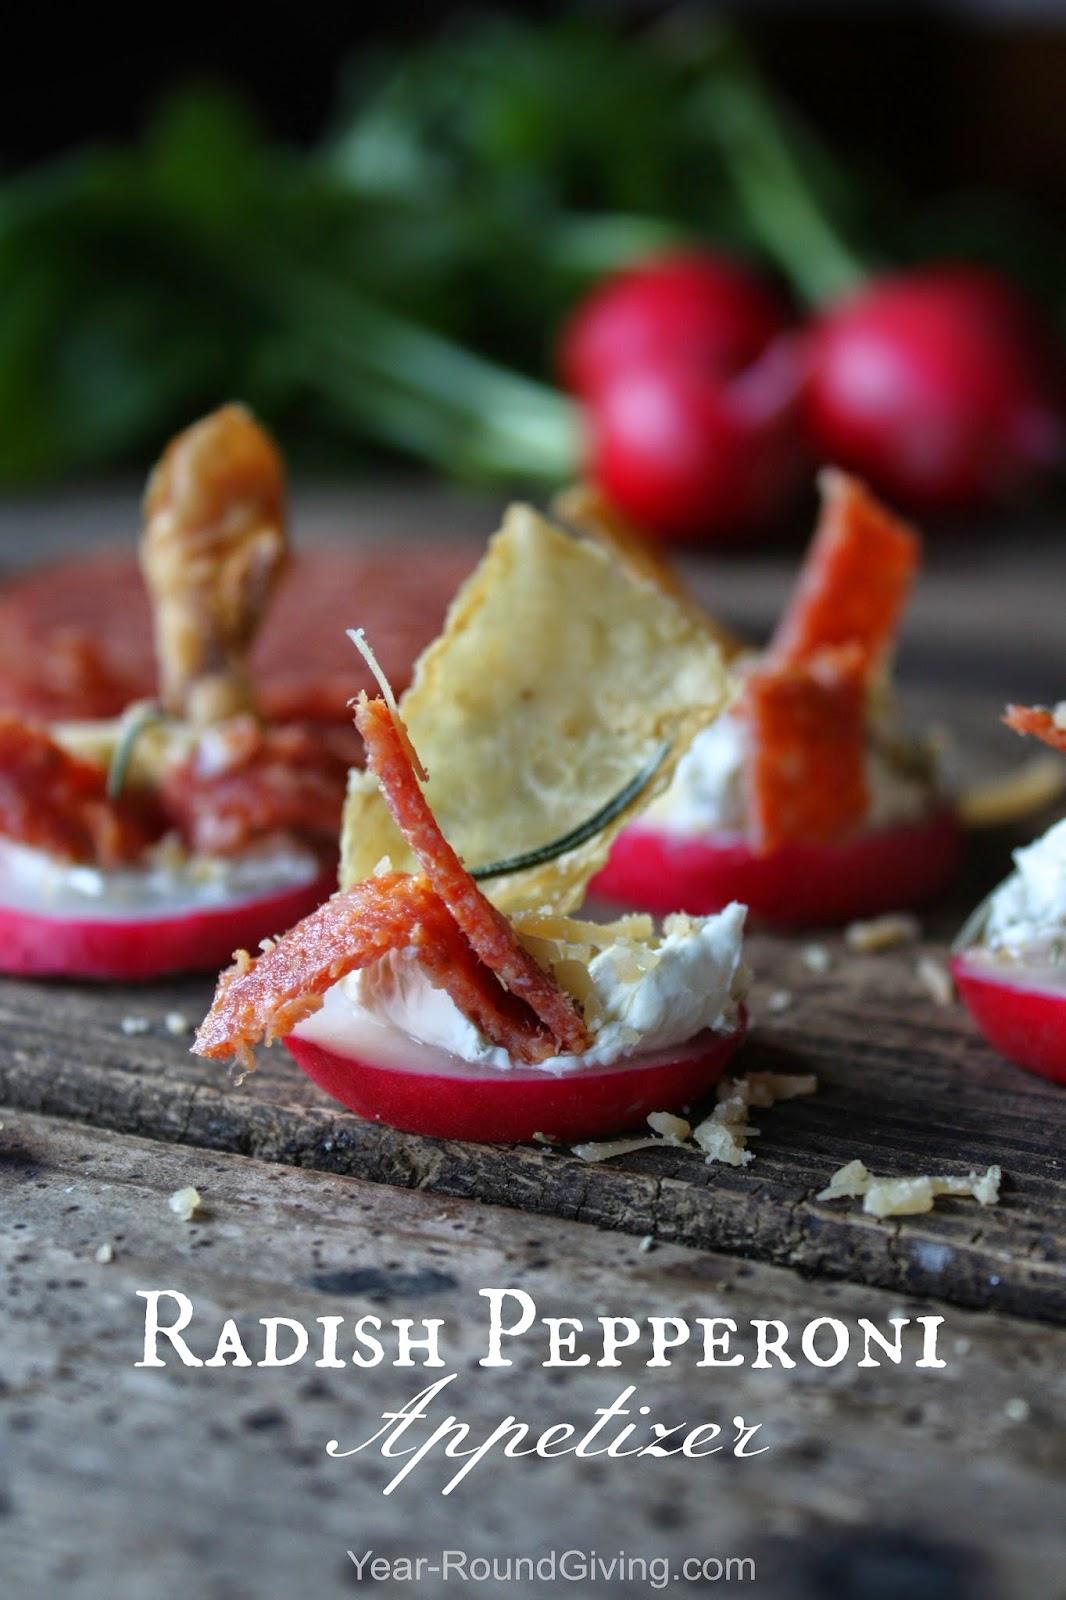 Radish Pepperoni Rustic Appetizer